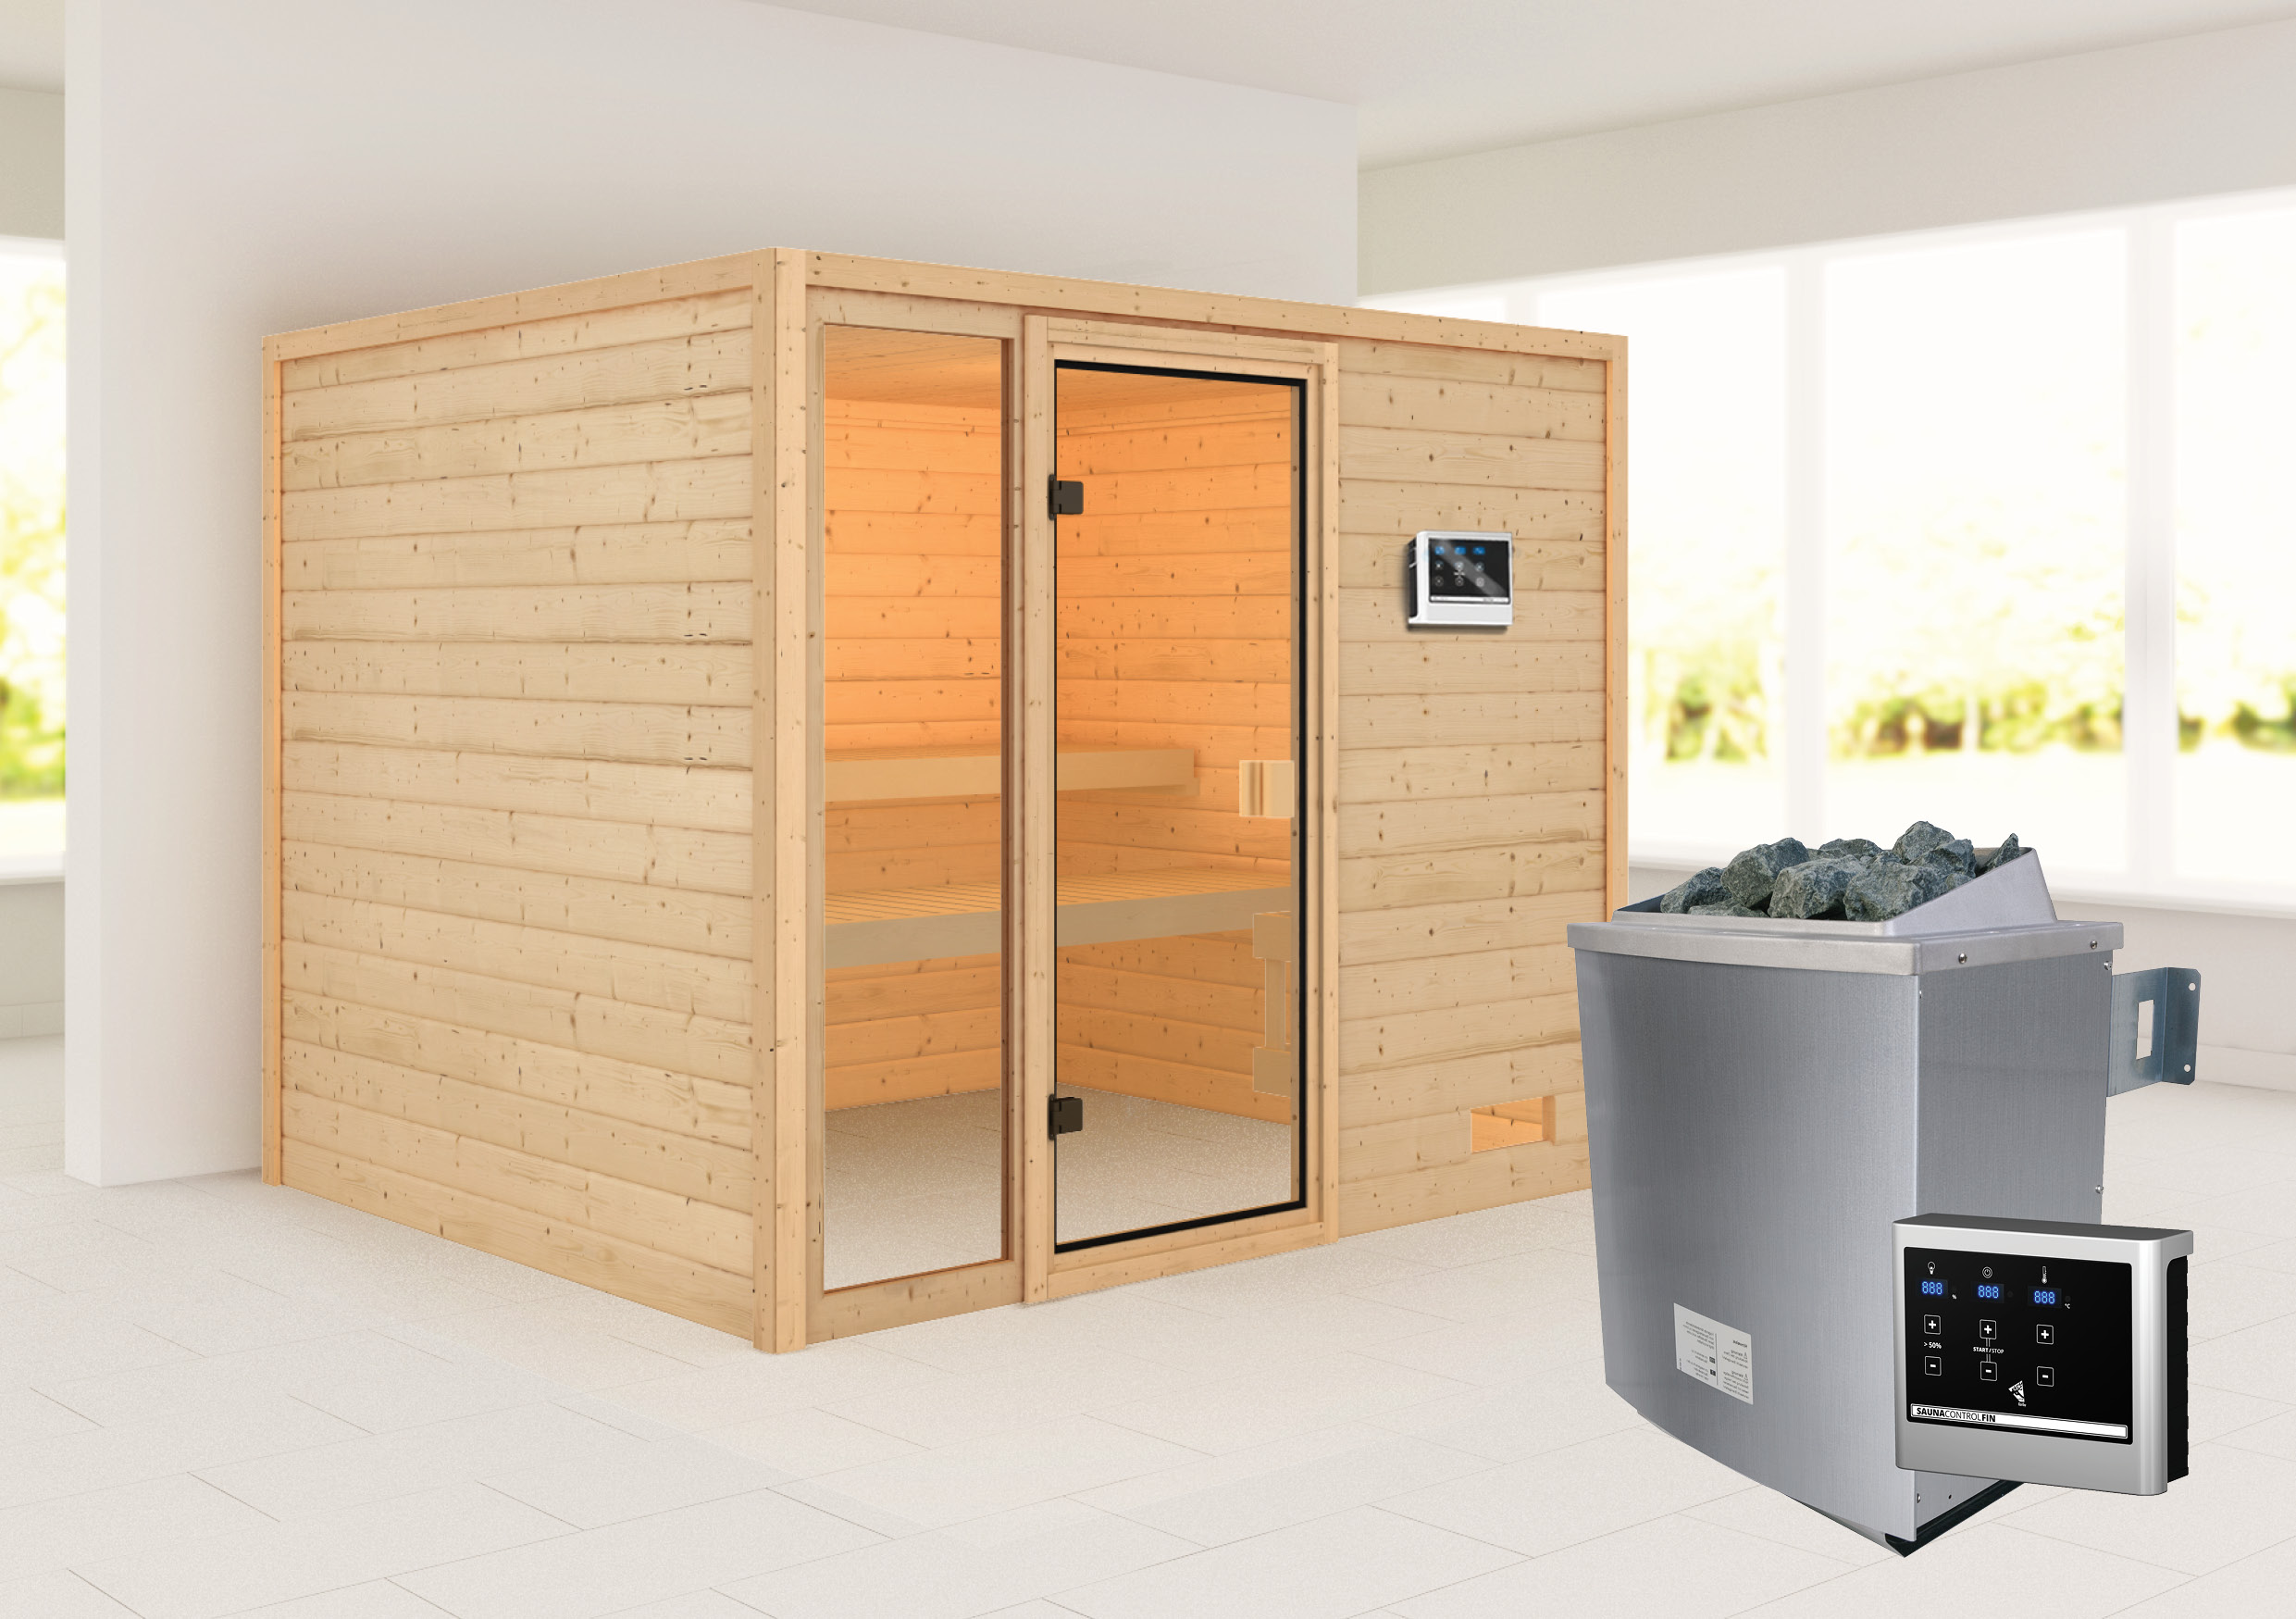 Woodfeeling Sauna Kiana 38mm Saunaofen 9 kW extern Bild 1